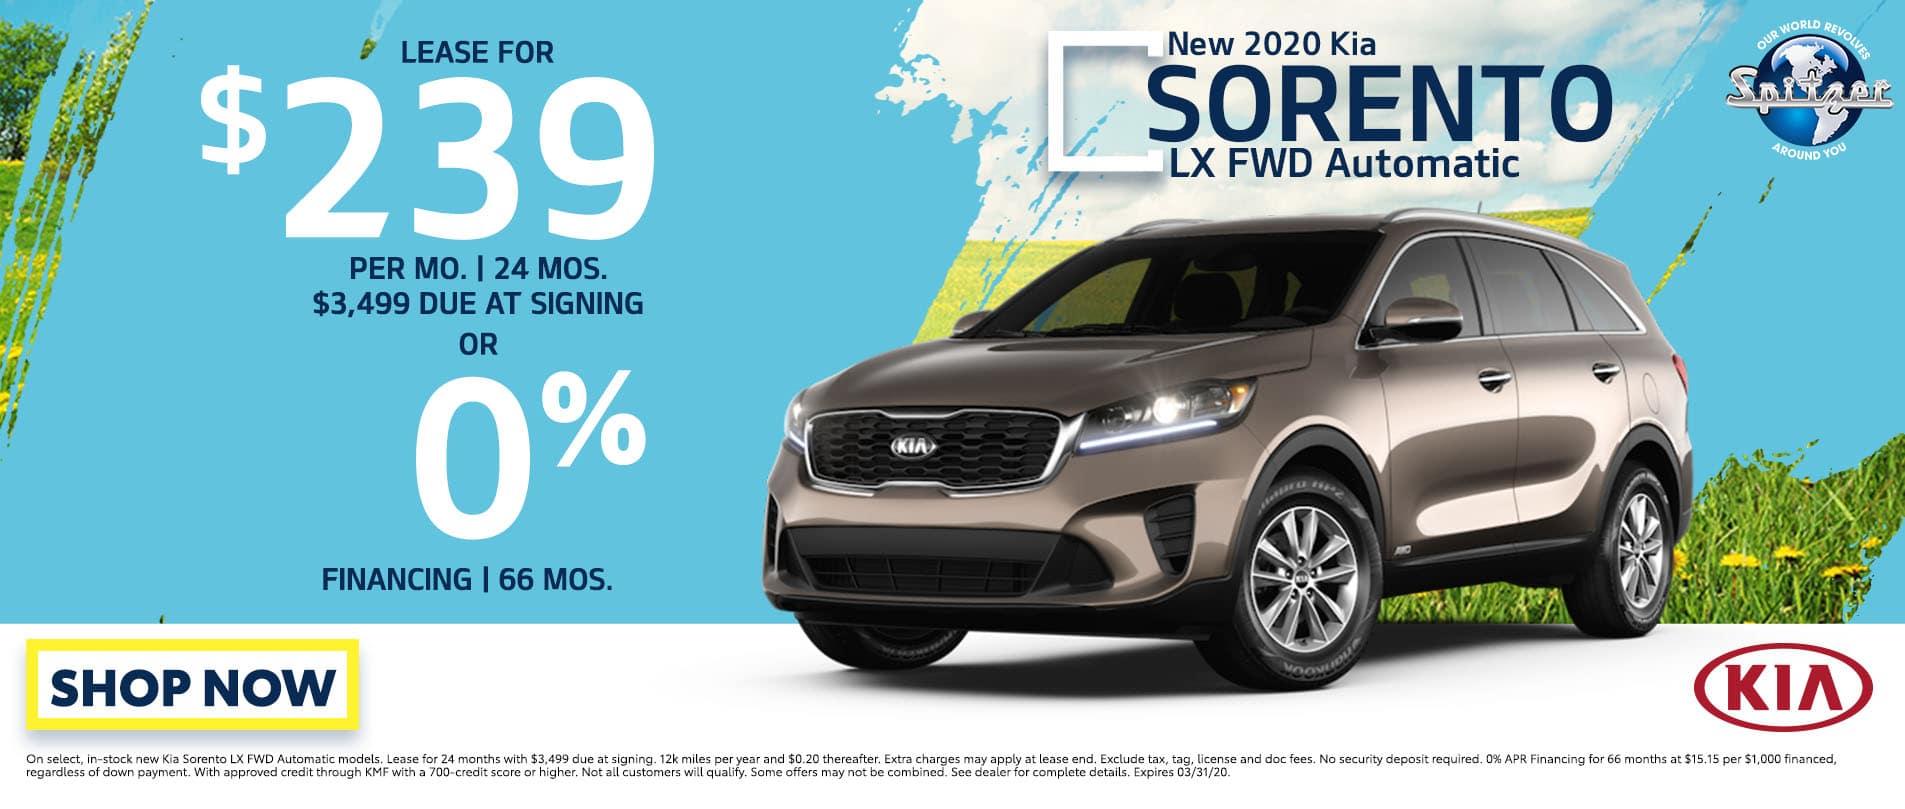 Sorento   Lease for $239